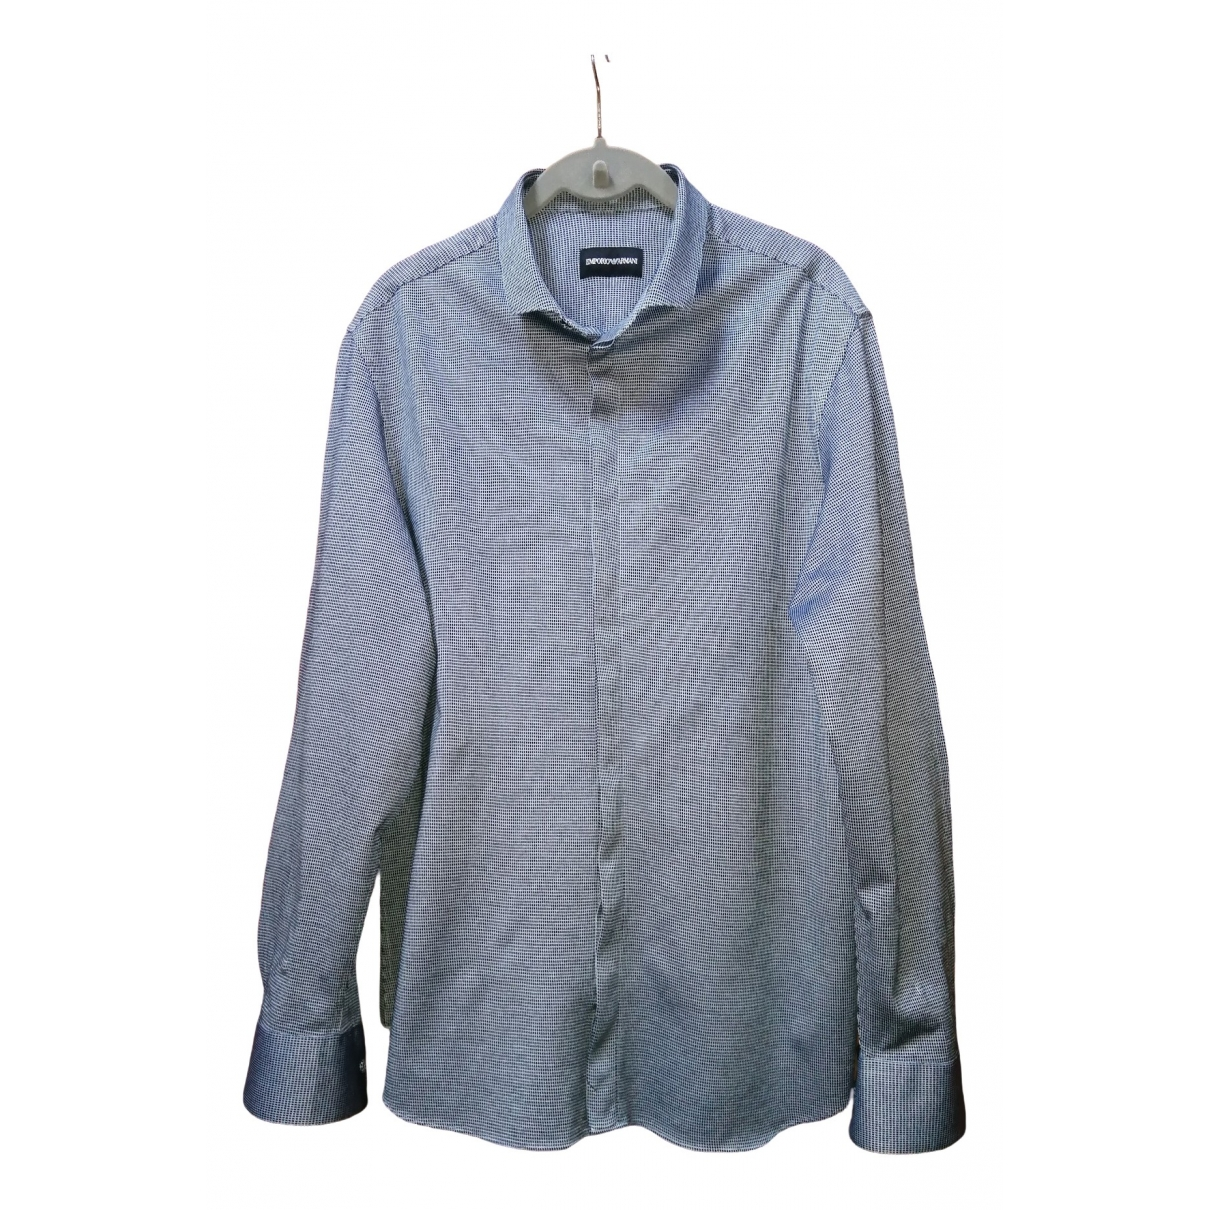 Emporio Armani \N Blue Cotton Shirts for Men L International